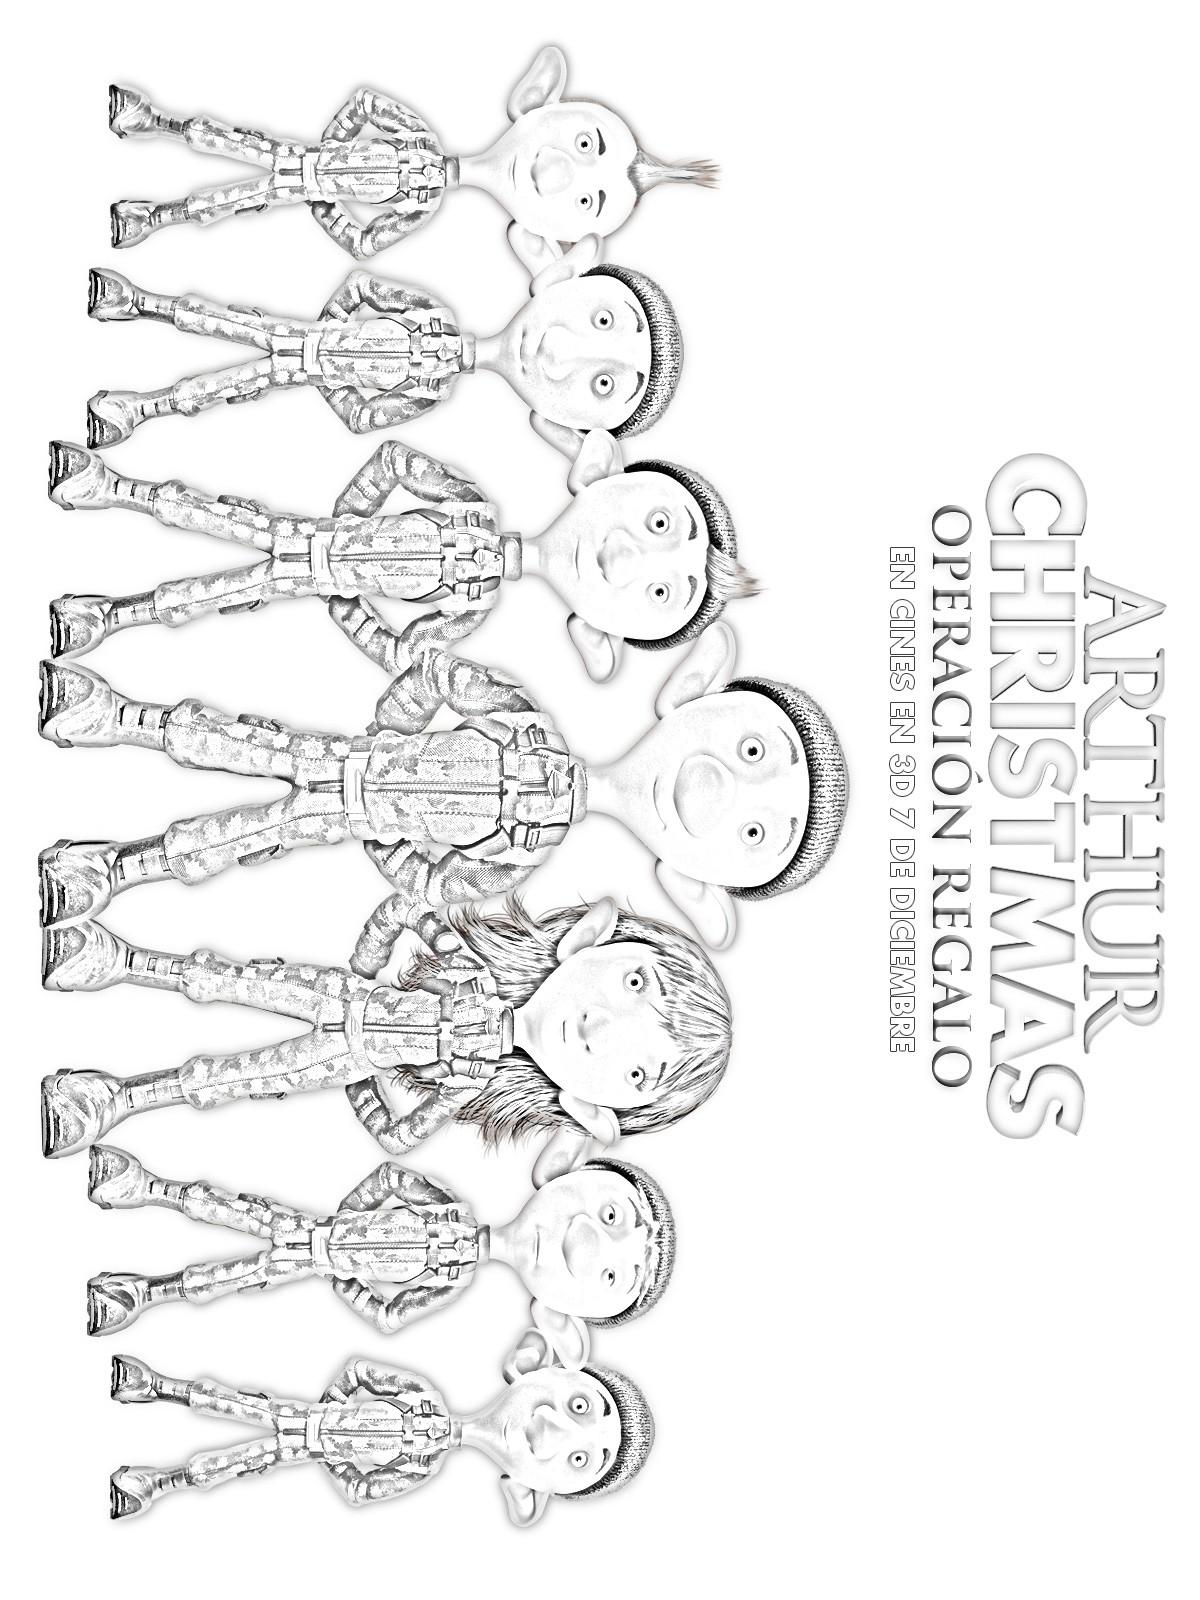 Dibujos para colorear elfos del padre de arthur - es.hellokids.com